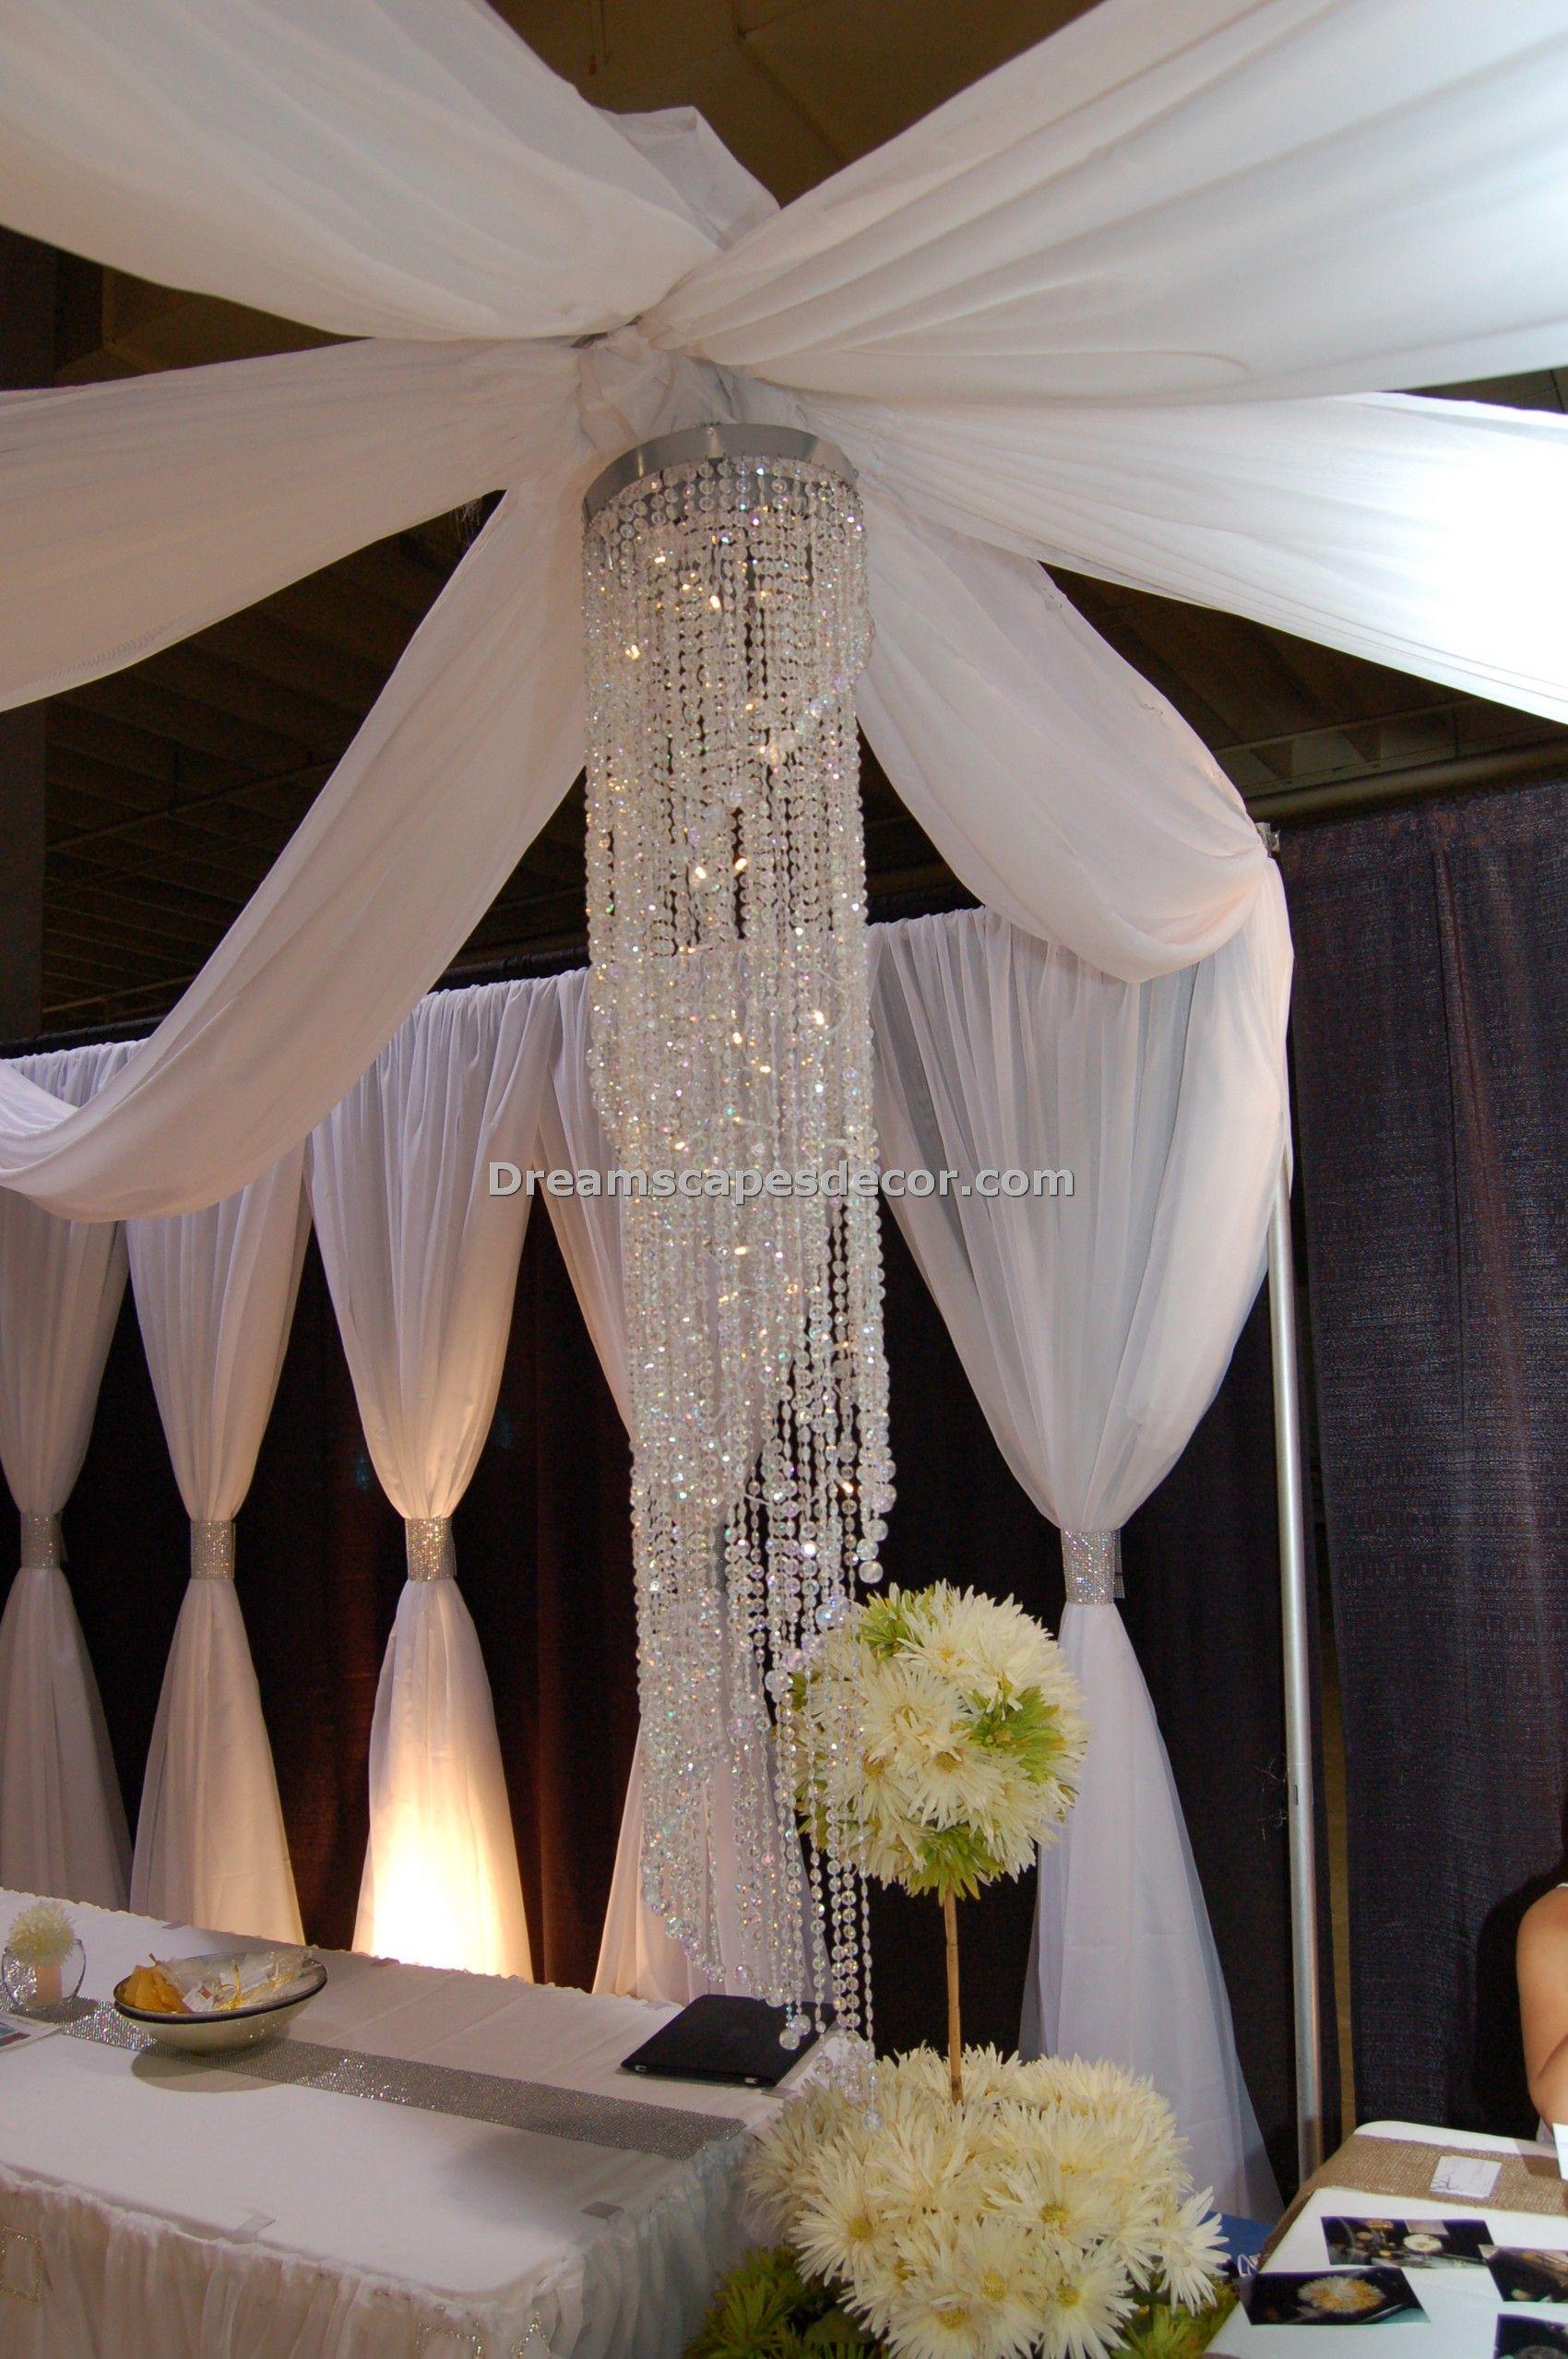 Ceiling Drape Open Canopy